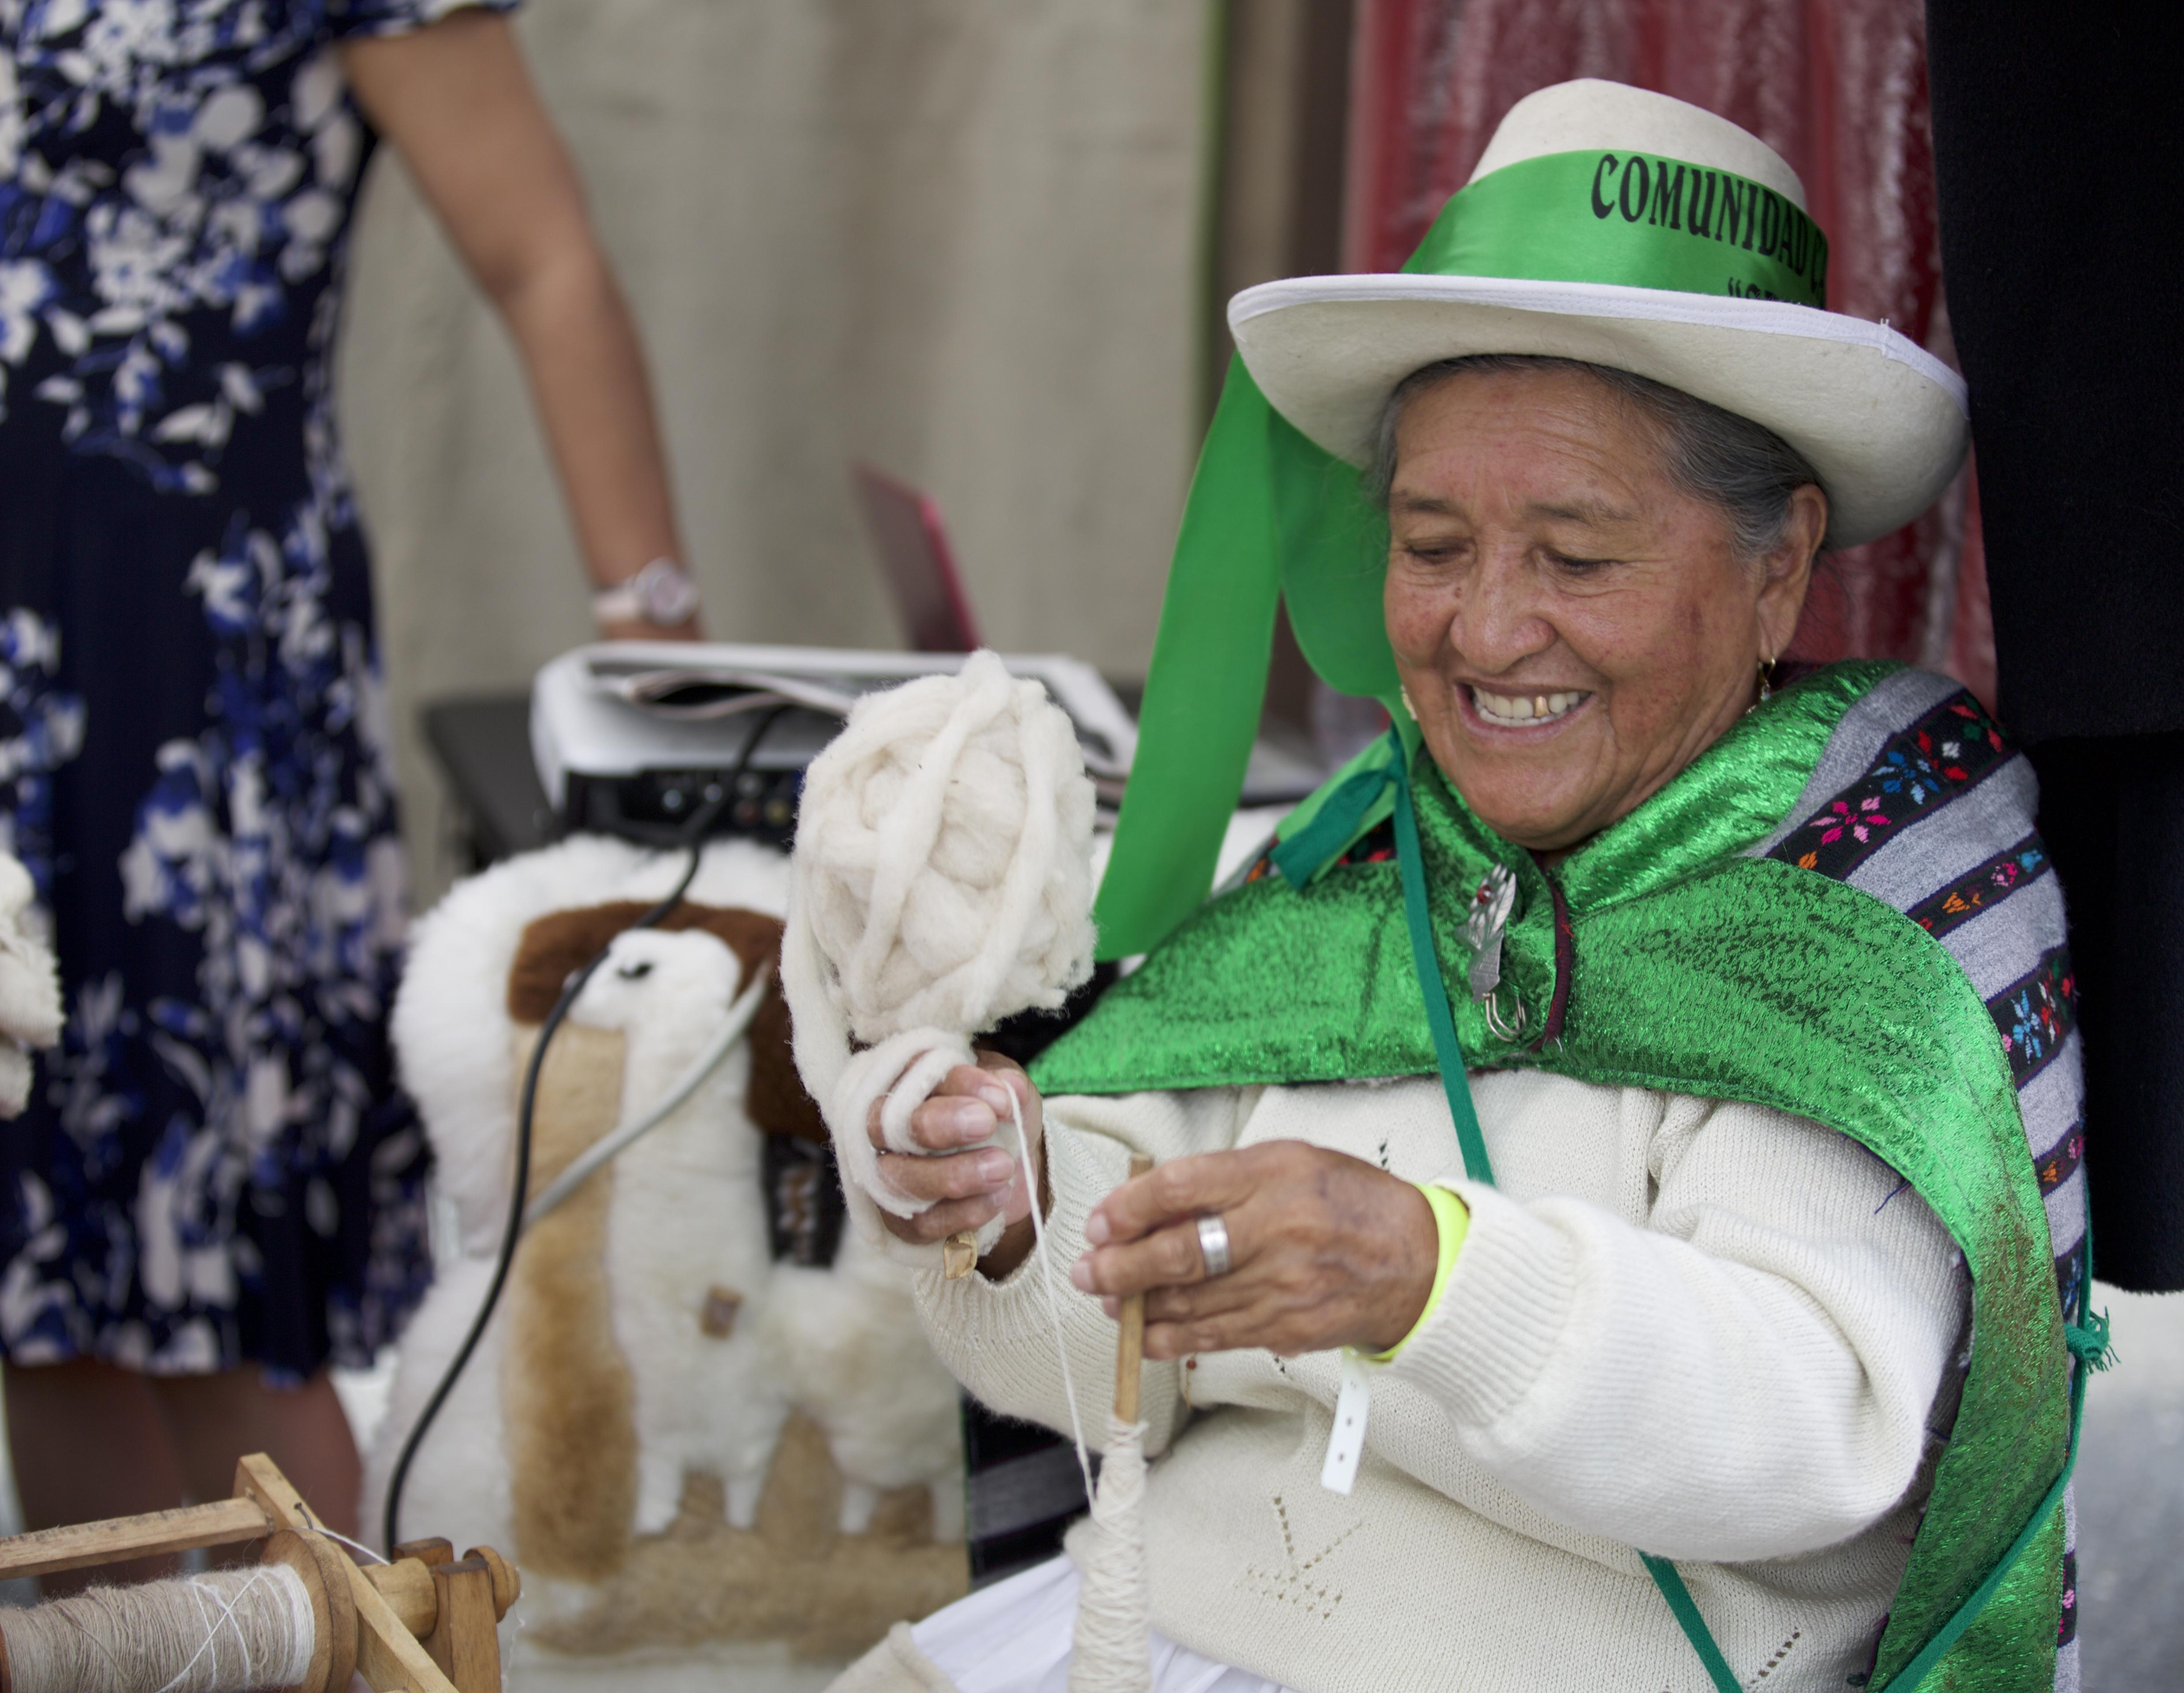 SUMAQ - Peruvian - Food - Festival - Garden City - Long Island - New York - Culture